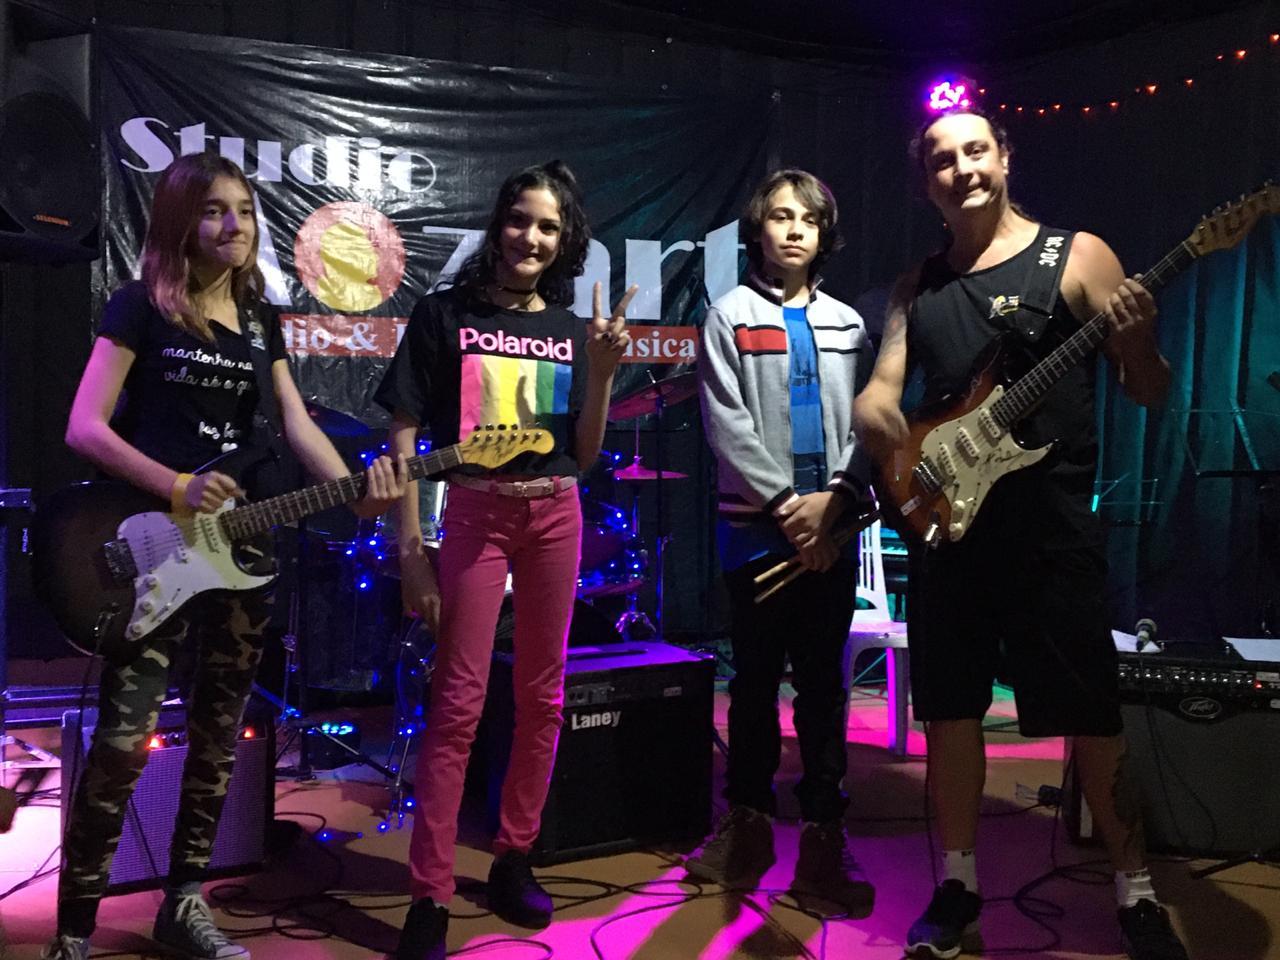 rock-show-01